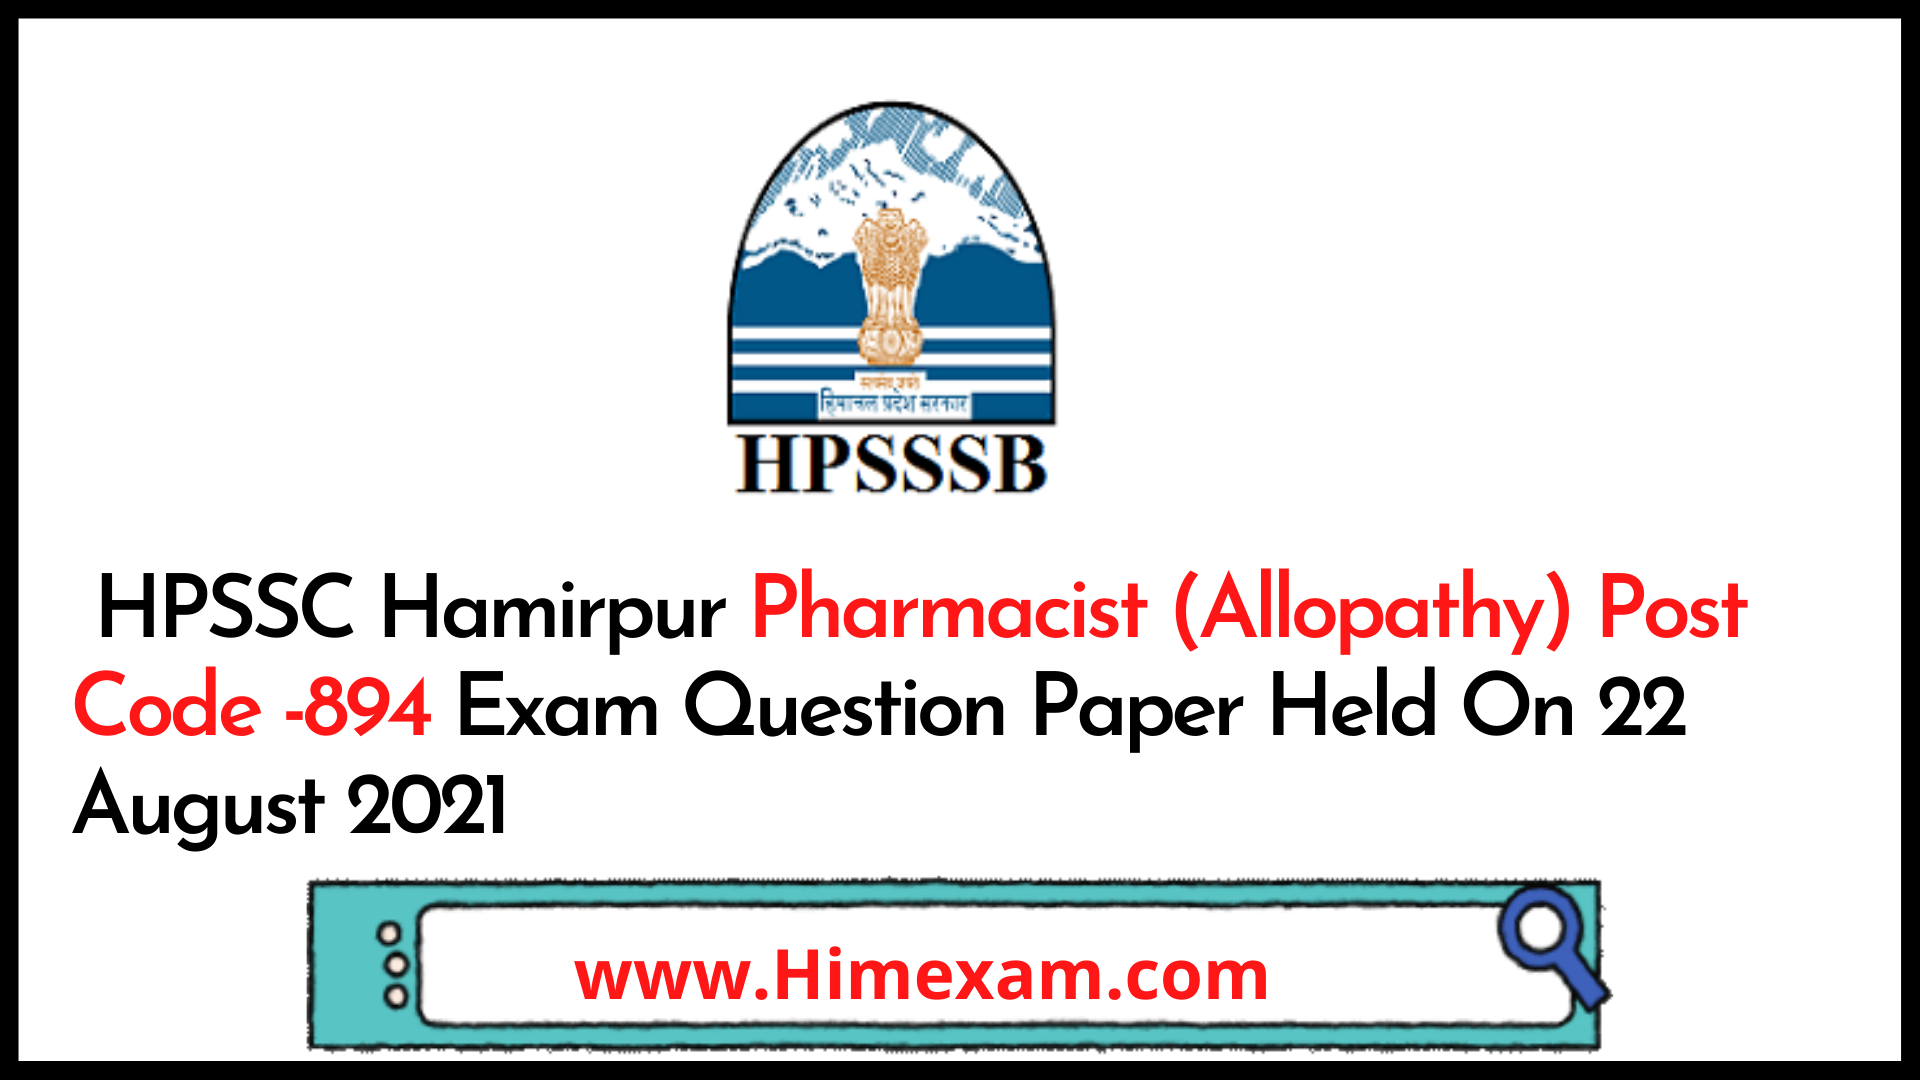 HPSSC Hamirpur Pharmacist (Allopathy)  Post Code -894 Exam Question Paper Held On 22 August 2021